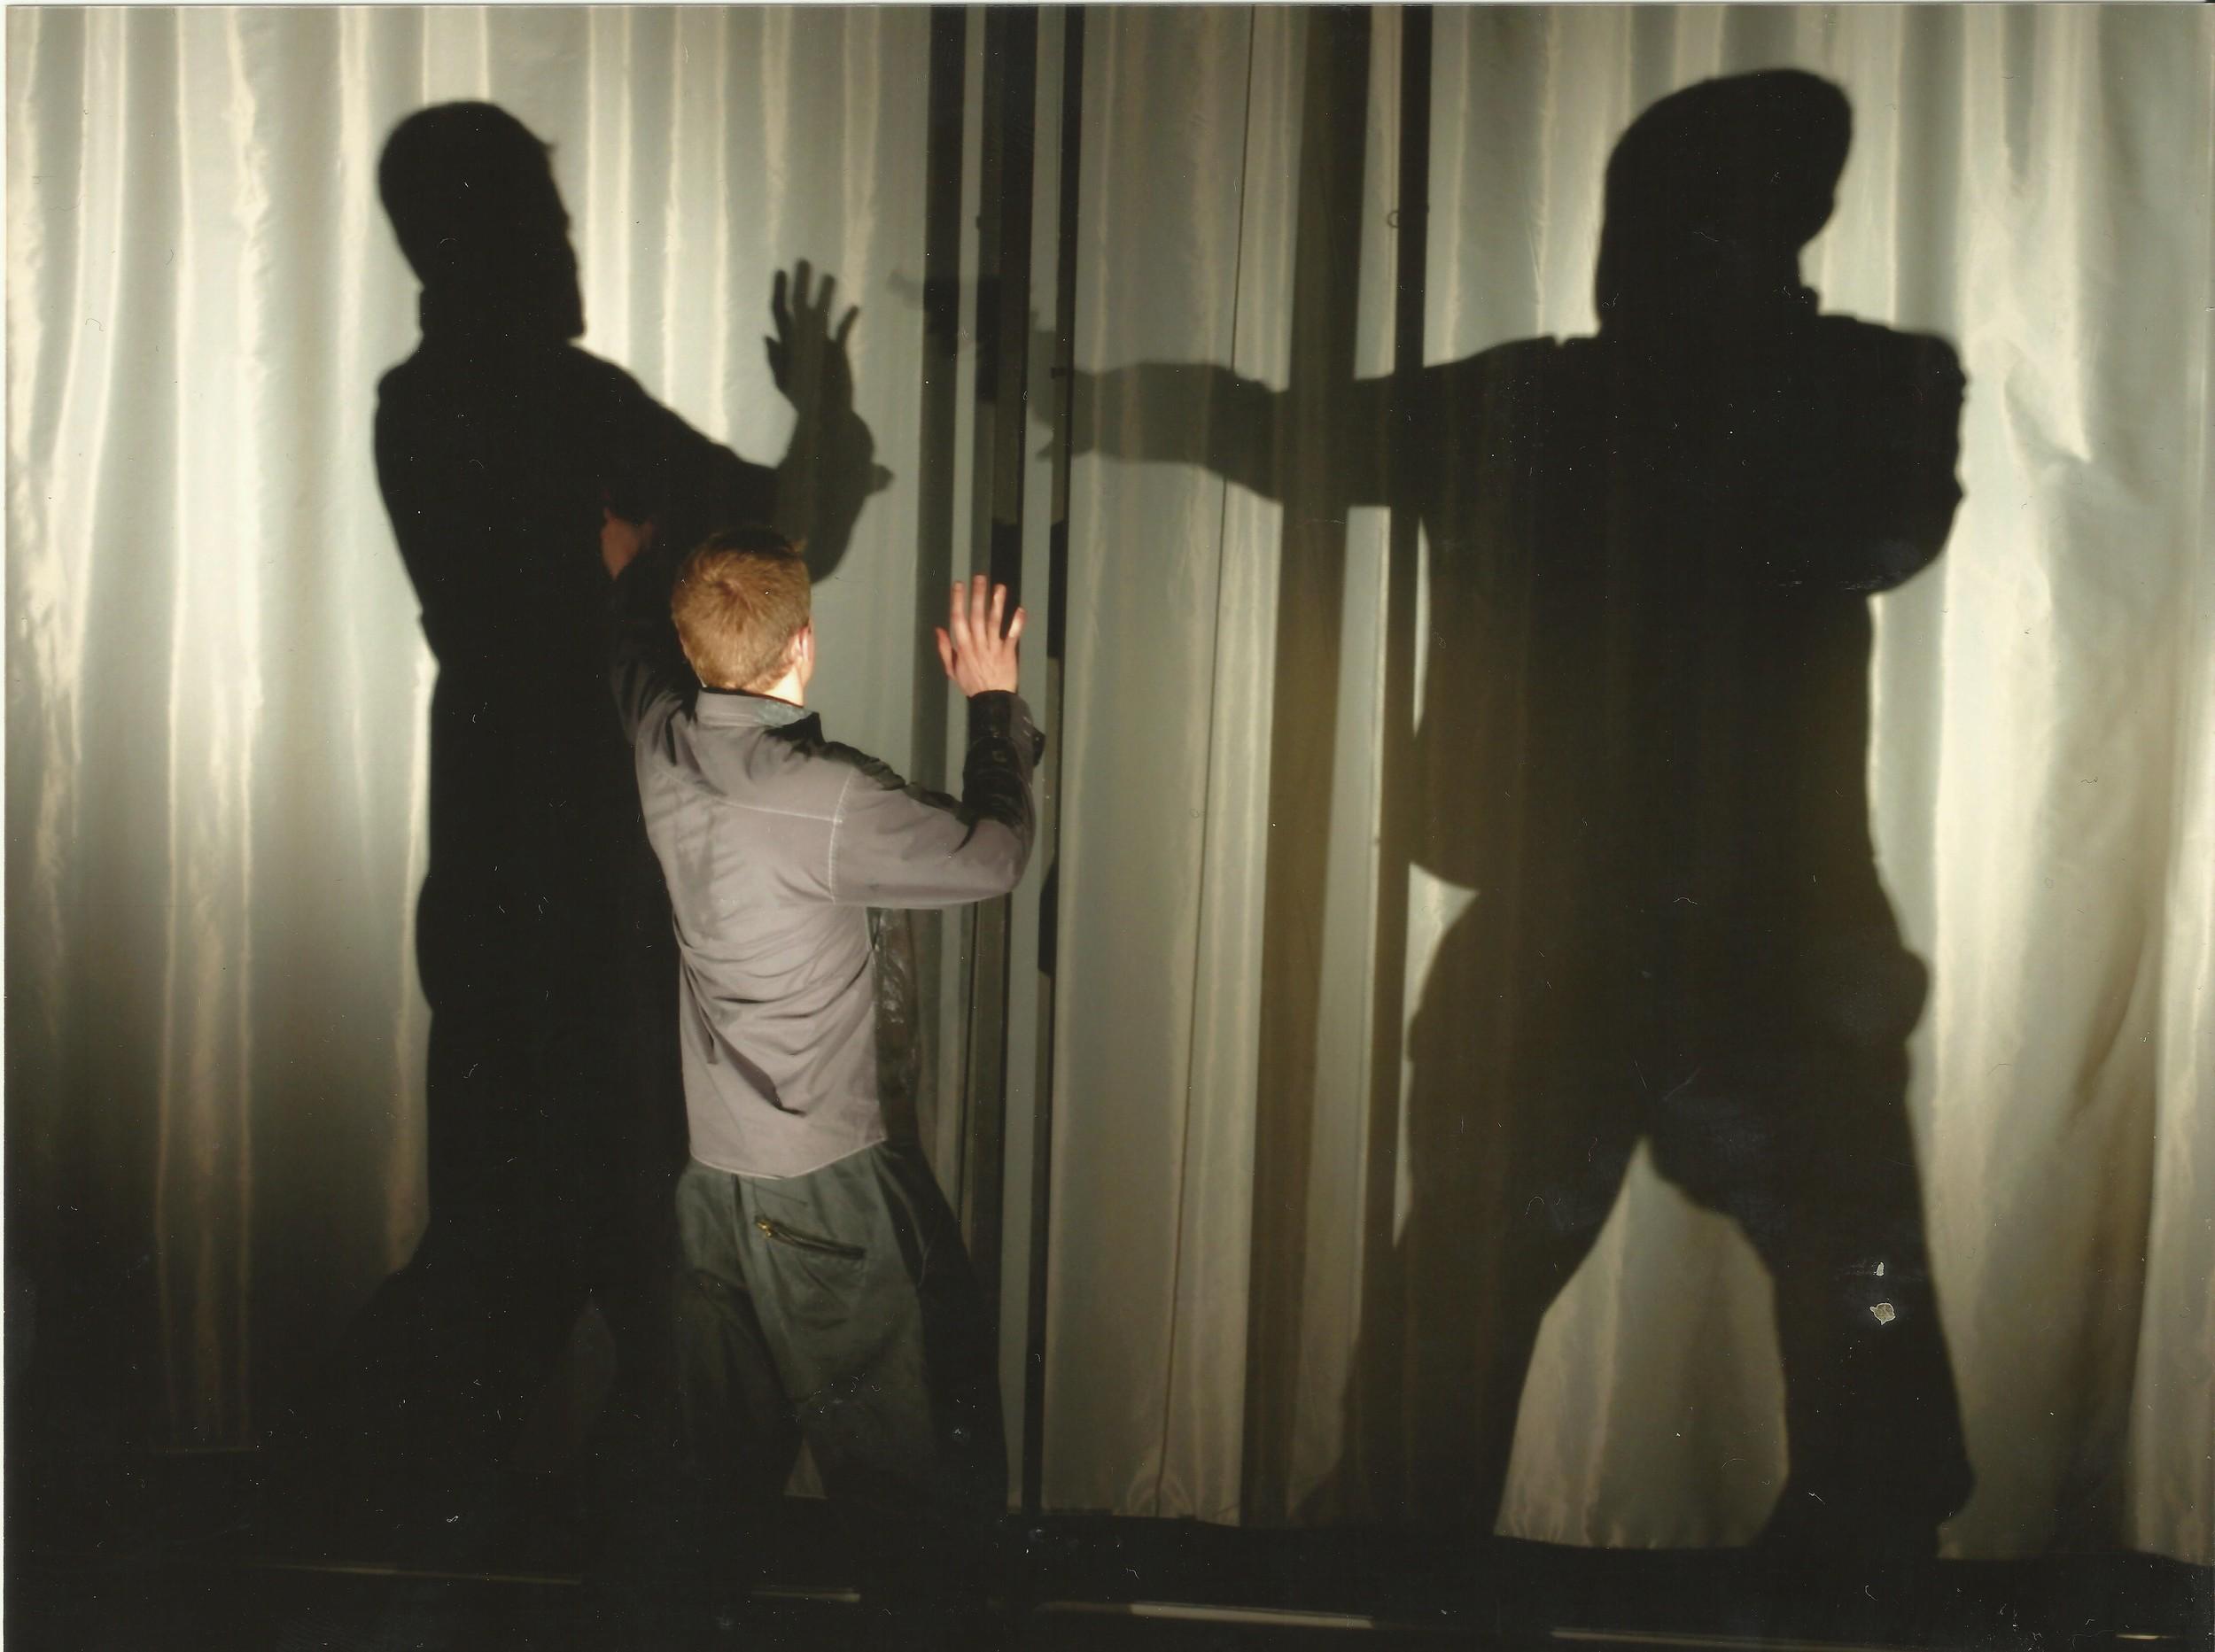 L'ombre, 2003